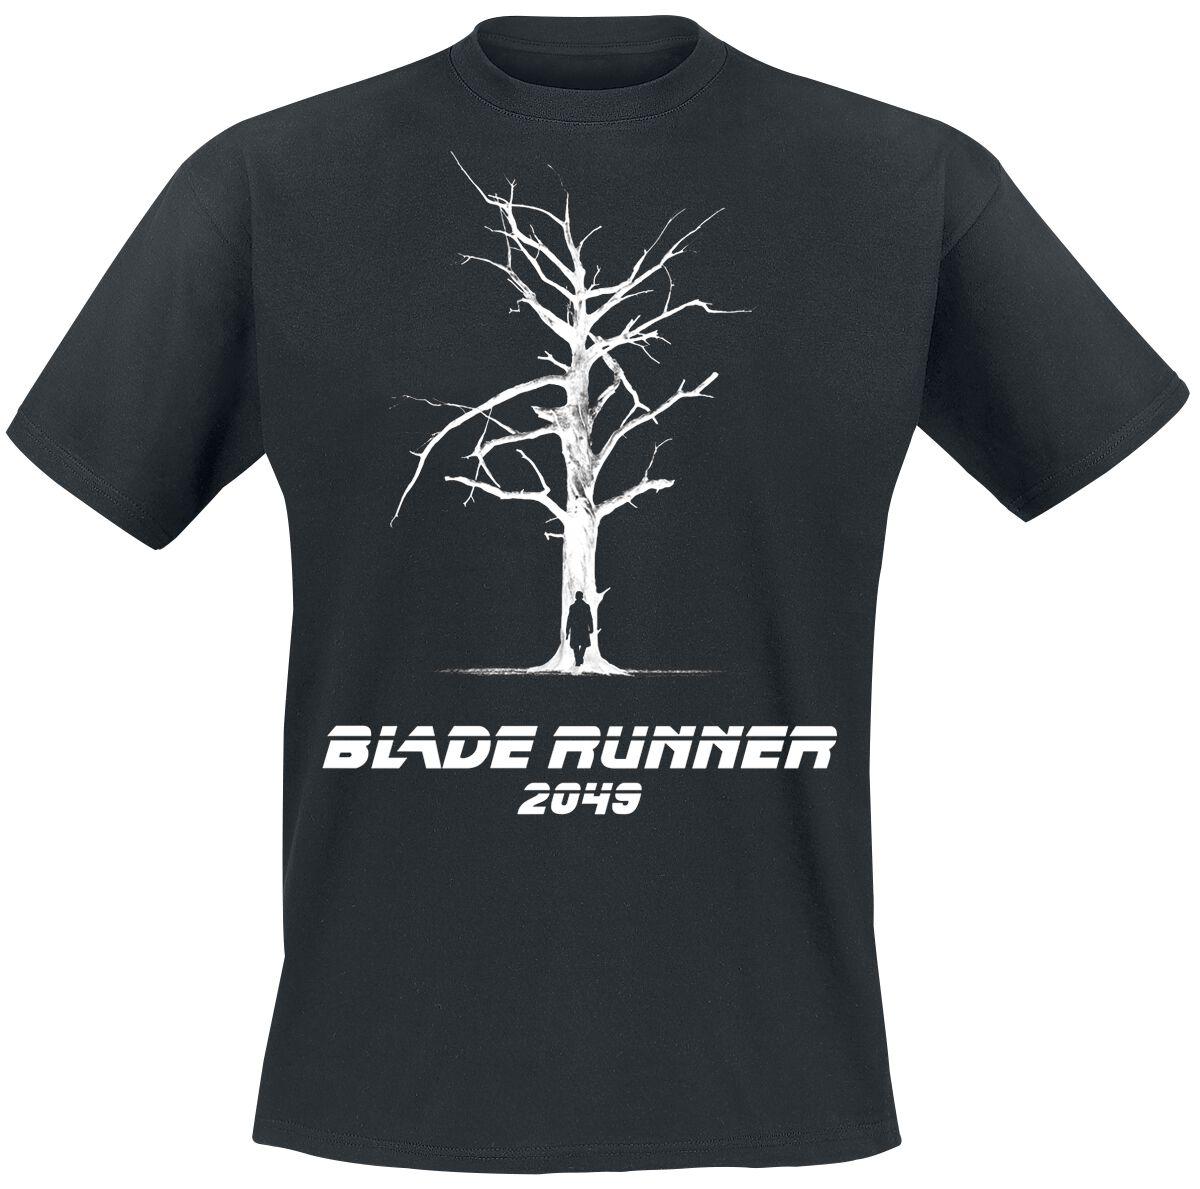 Merch dla Fanów - Koszulki - T-Shirt Blade Runner 2049 - Tree T-Shirt czarny - 369277